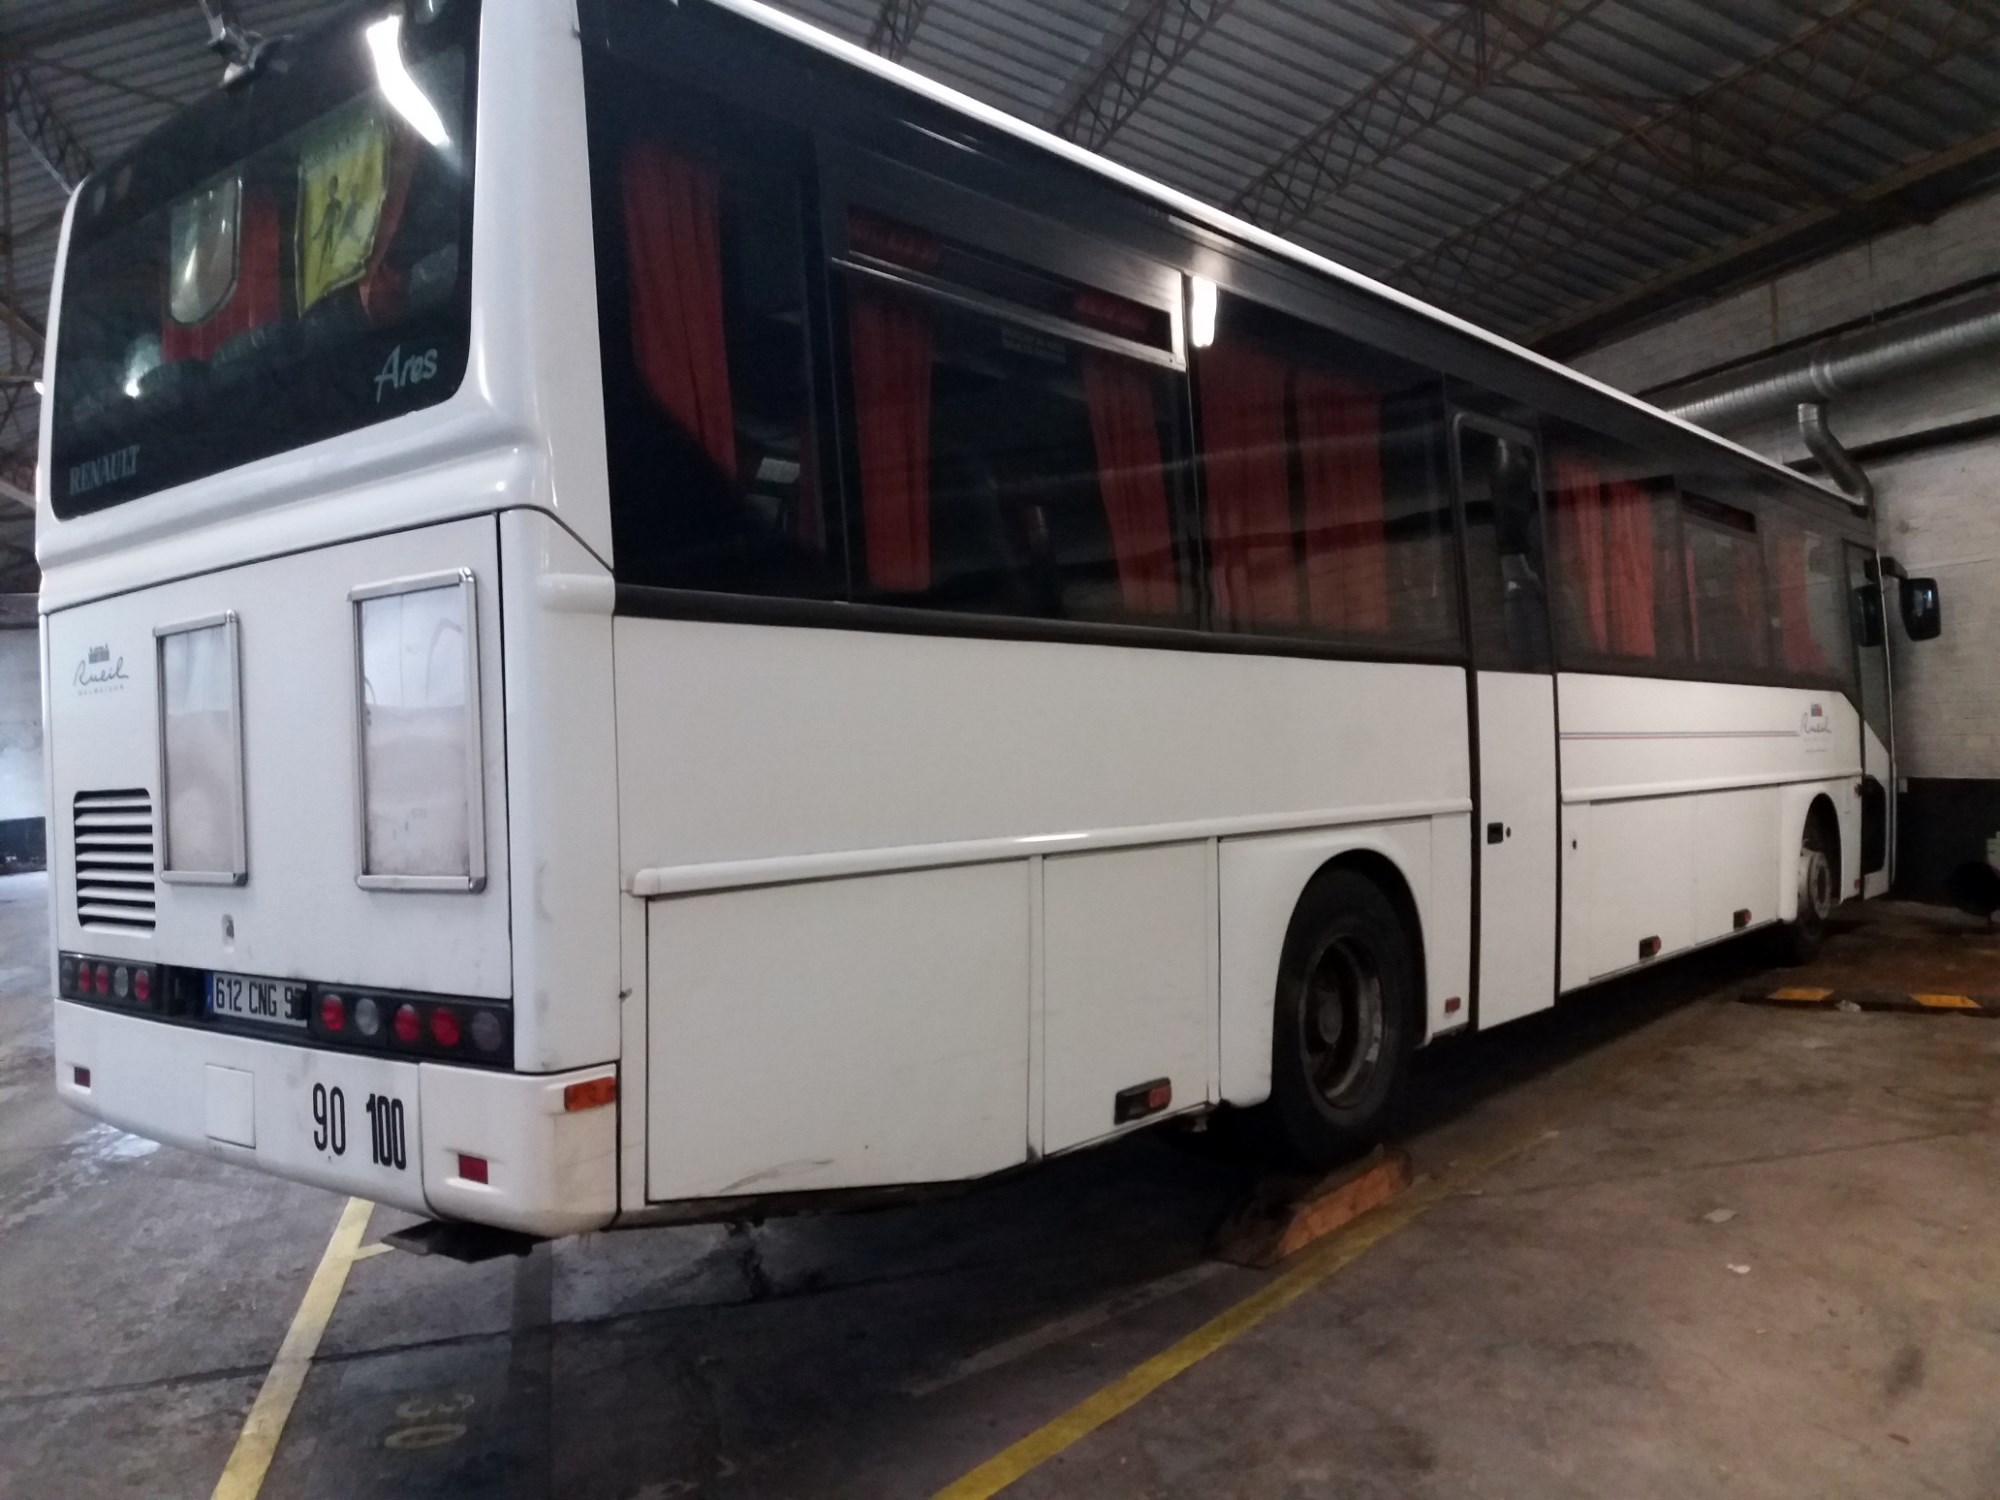 autocar renault ares car bus d 39 occasion aux ench res agorastore. Black Bedroom Furniture Sets. Home Design Ideas